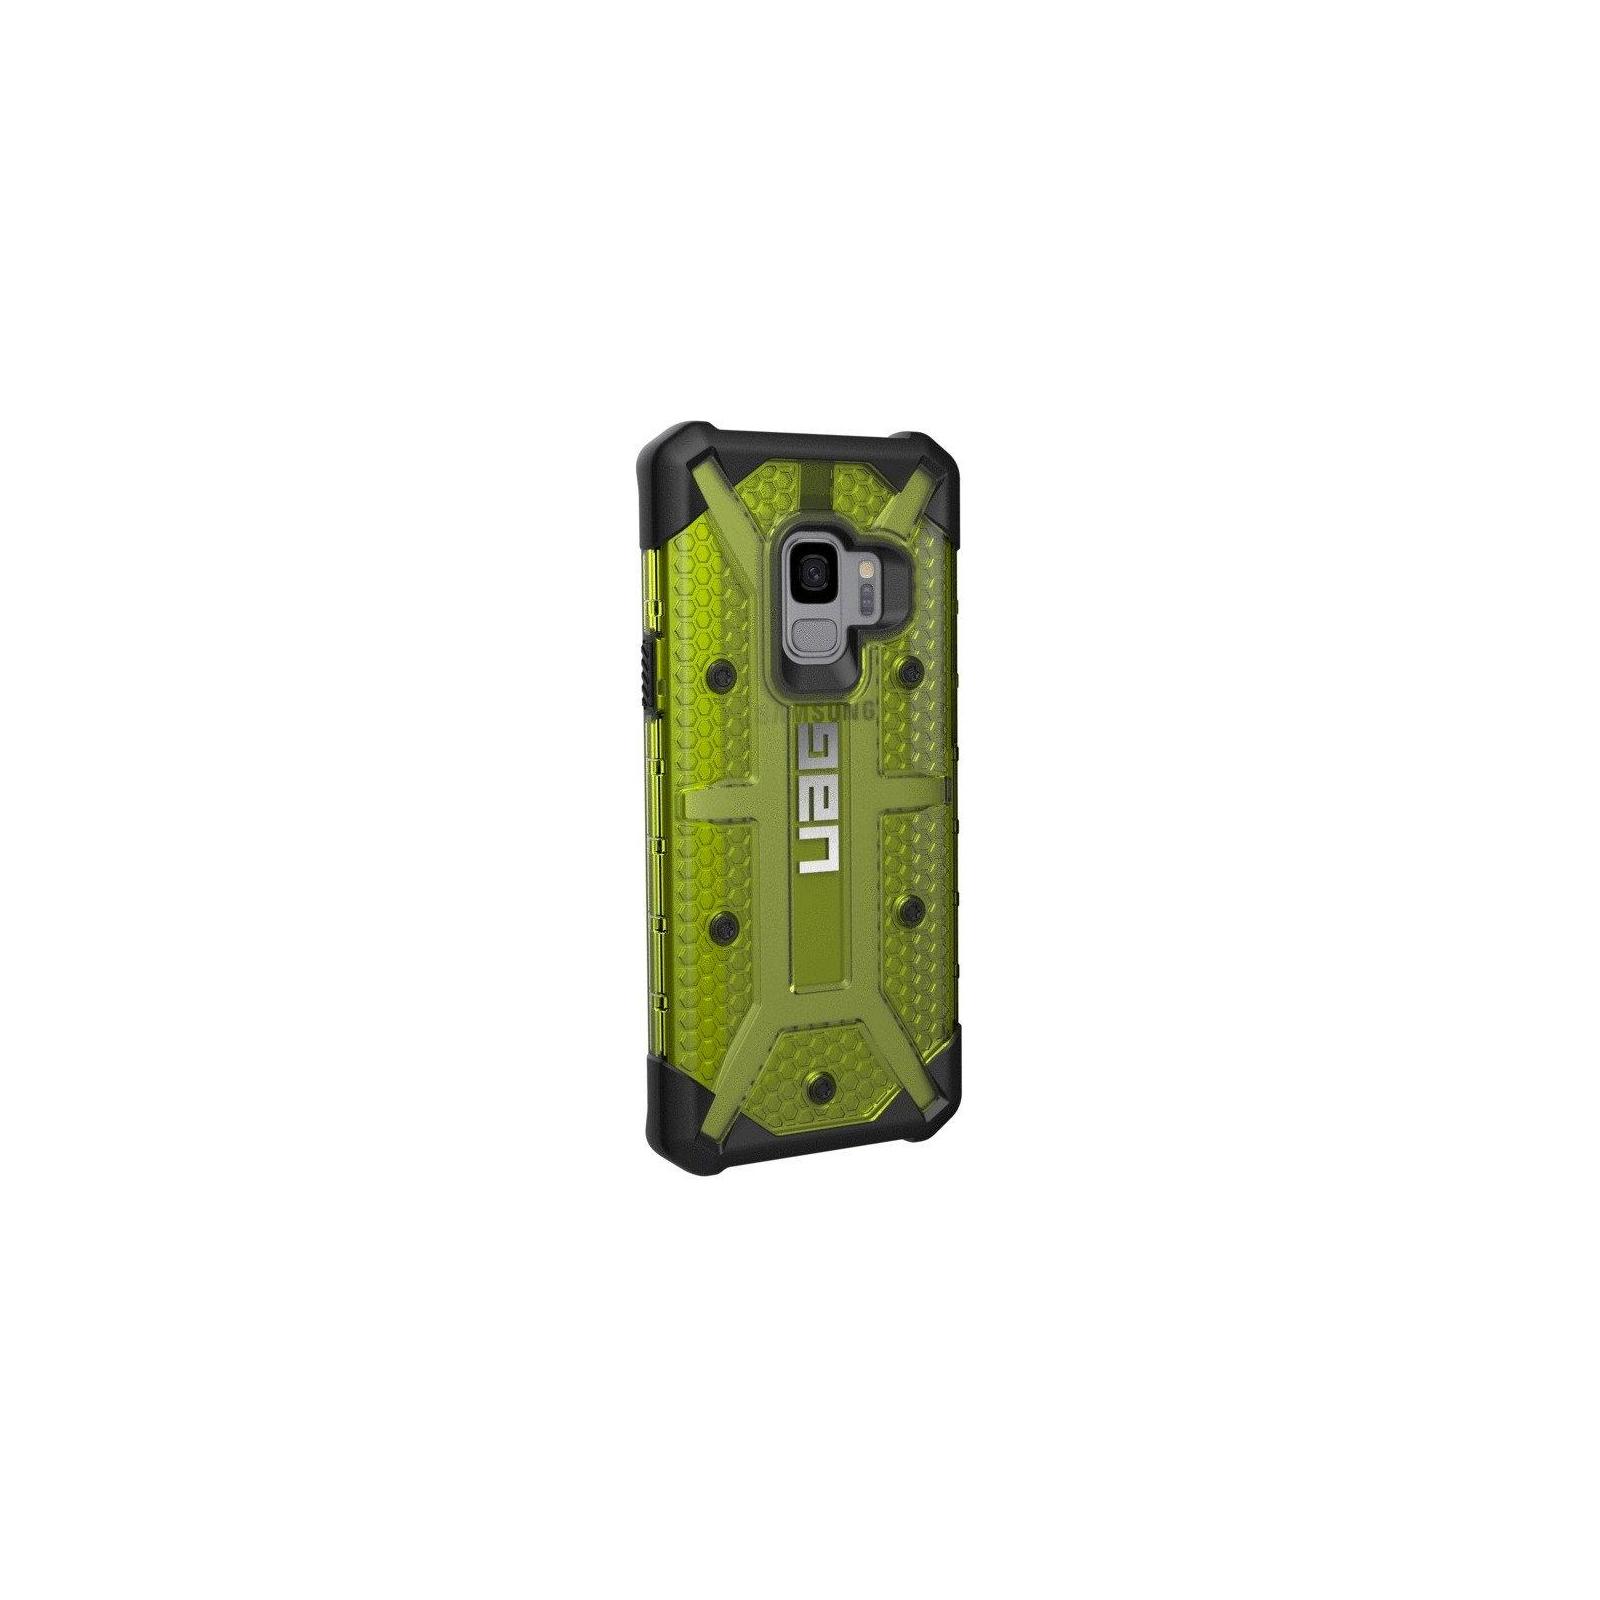 Чехол для моб. телефона Urban Armor Gear Galaxy S9 Plasma Citron (GLXS9-L-CT) изображение 3